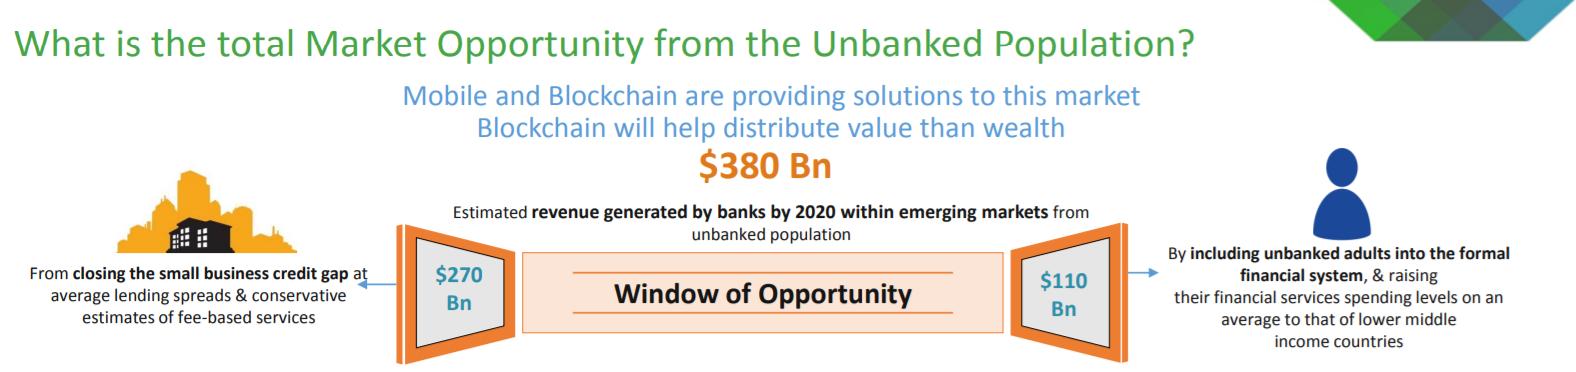 Blockchain unbanked market opportunity